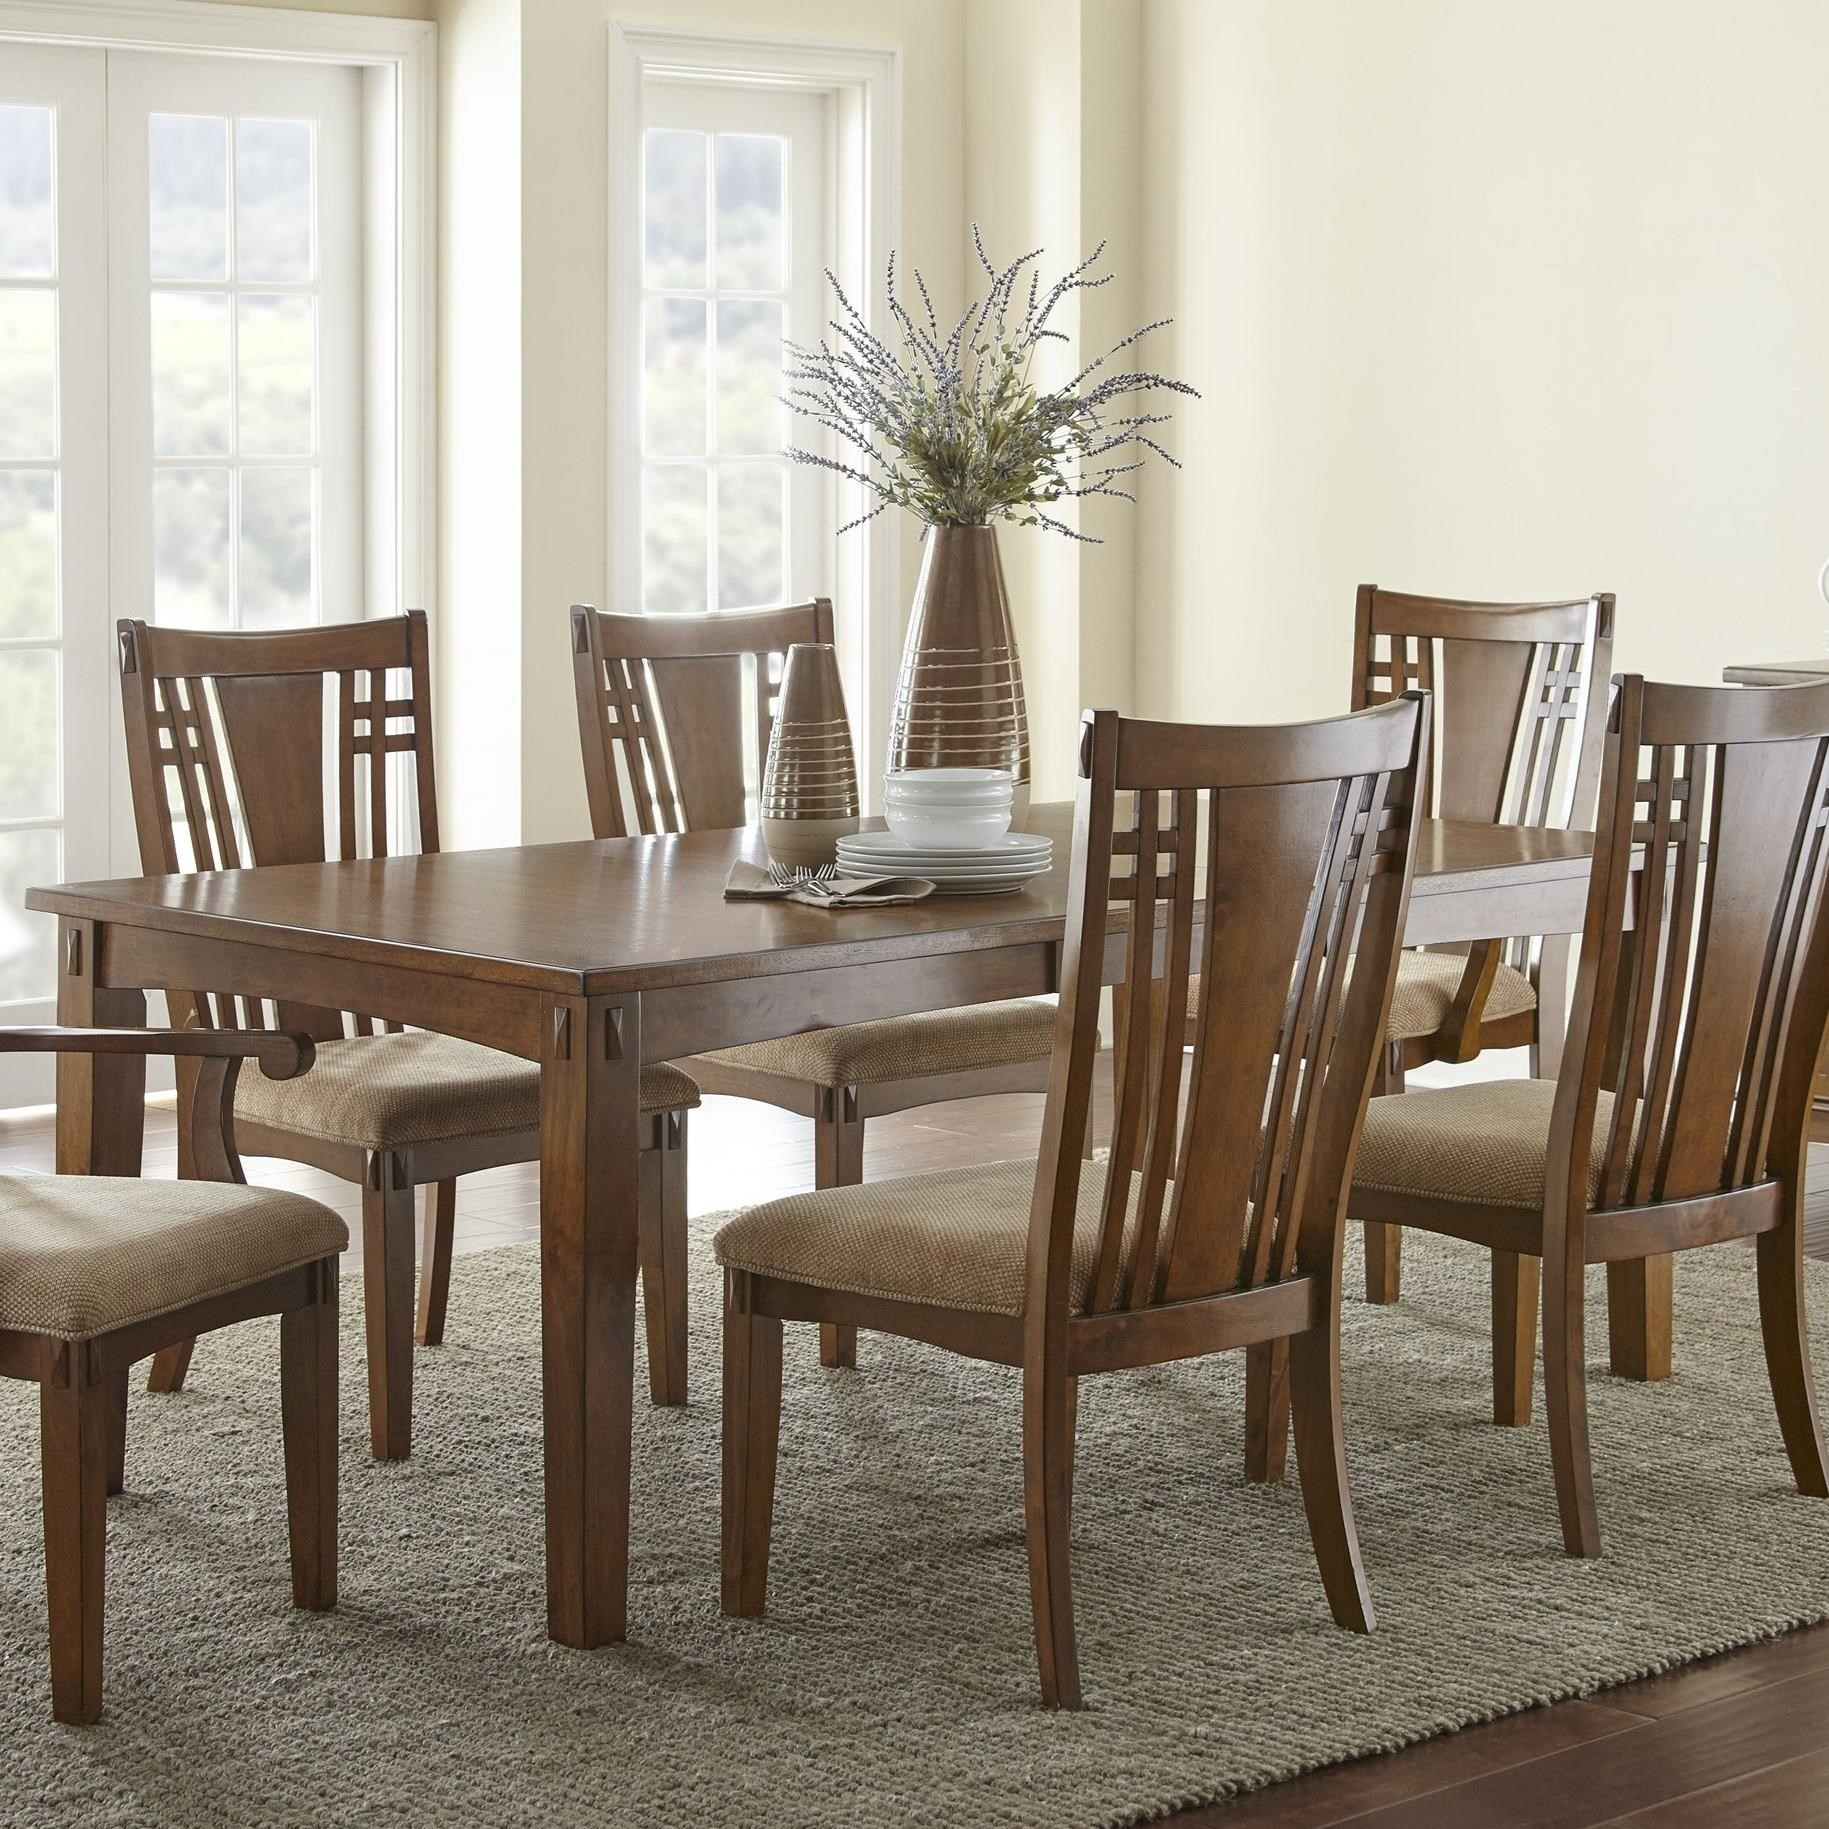 Steve Silver Larkin Lk550 Mission Rectangular Table With 20 Leaf Vandrie Home Furnishings